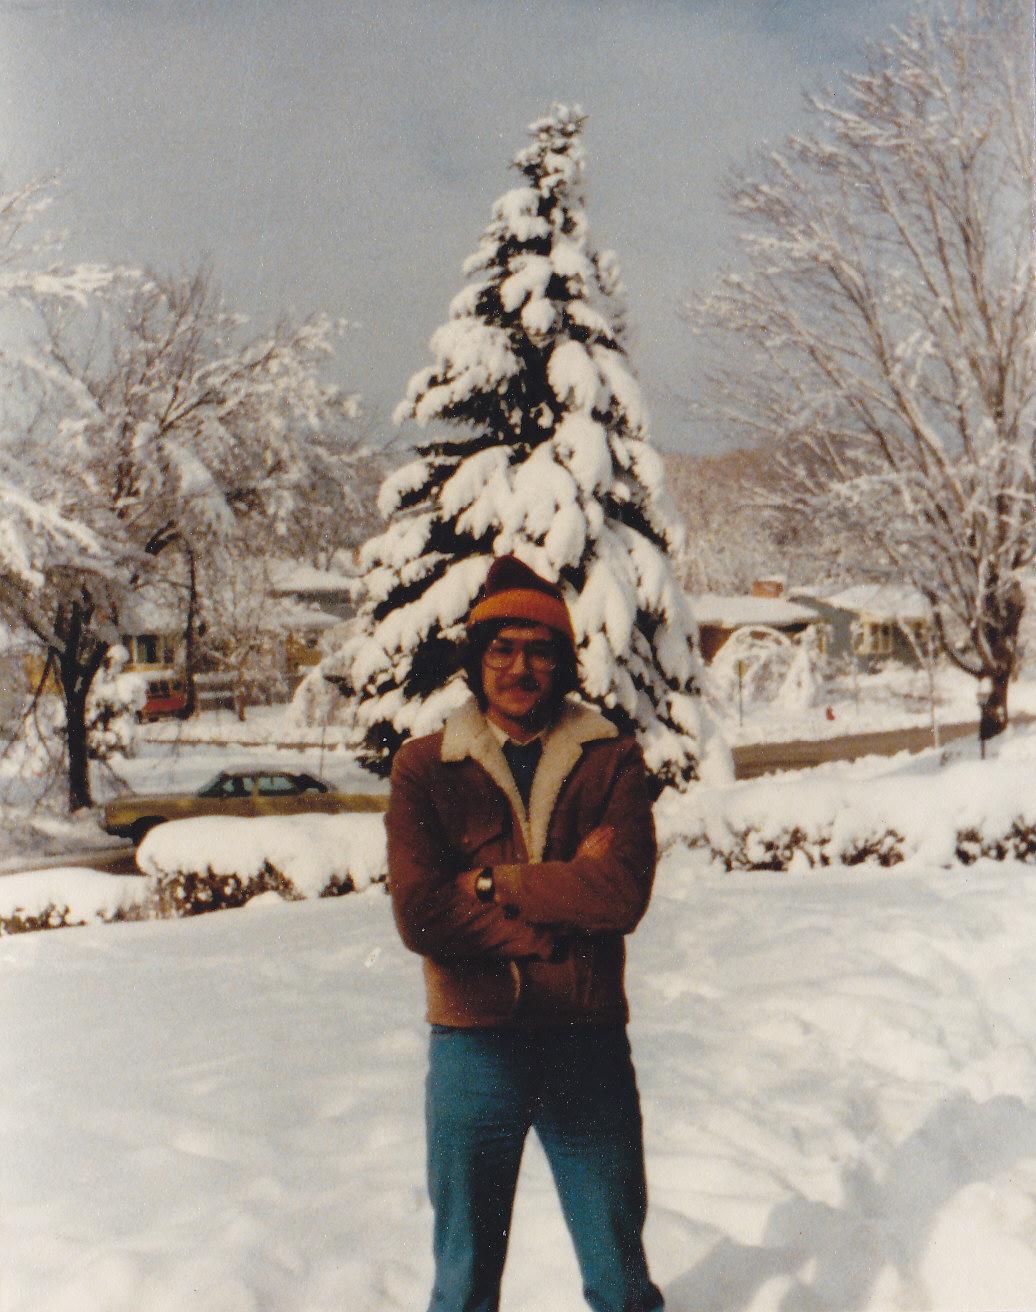 1982 MInnesota winter